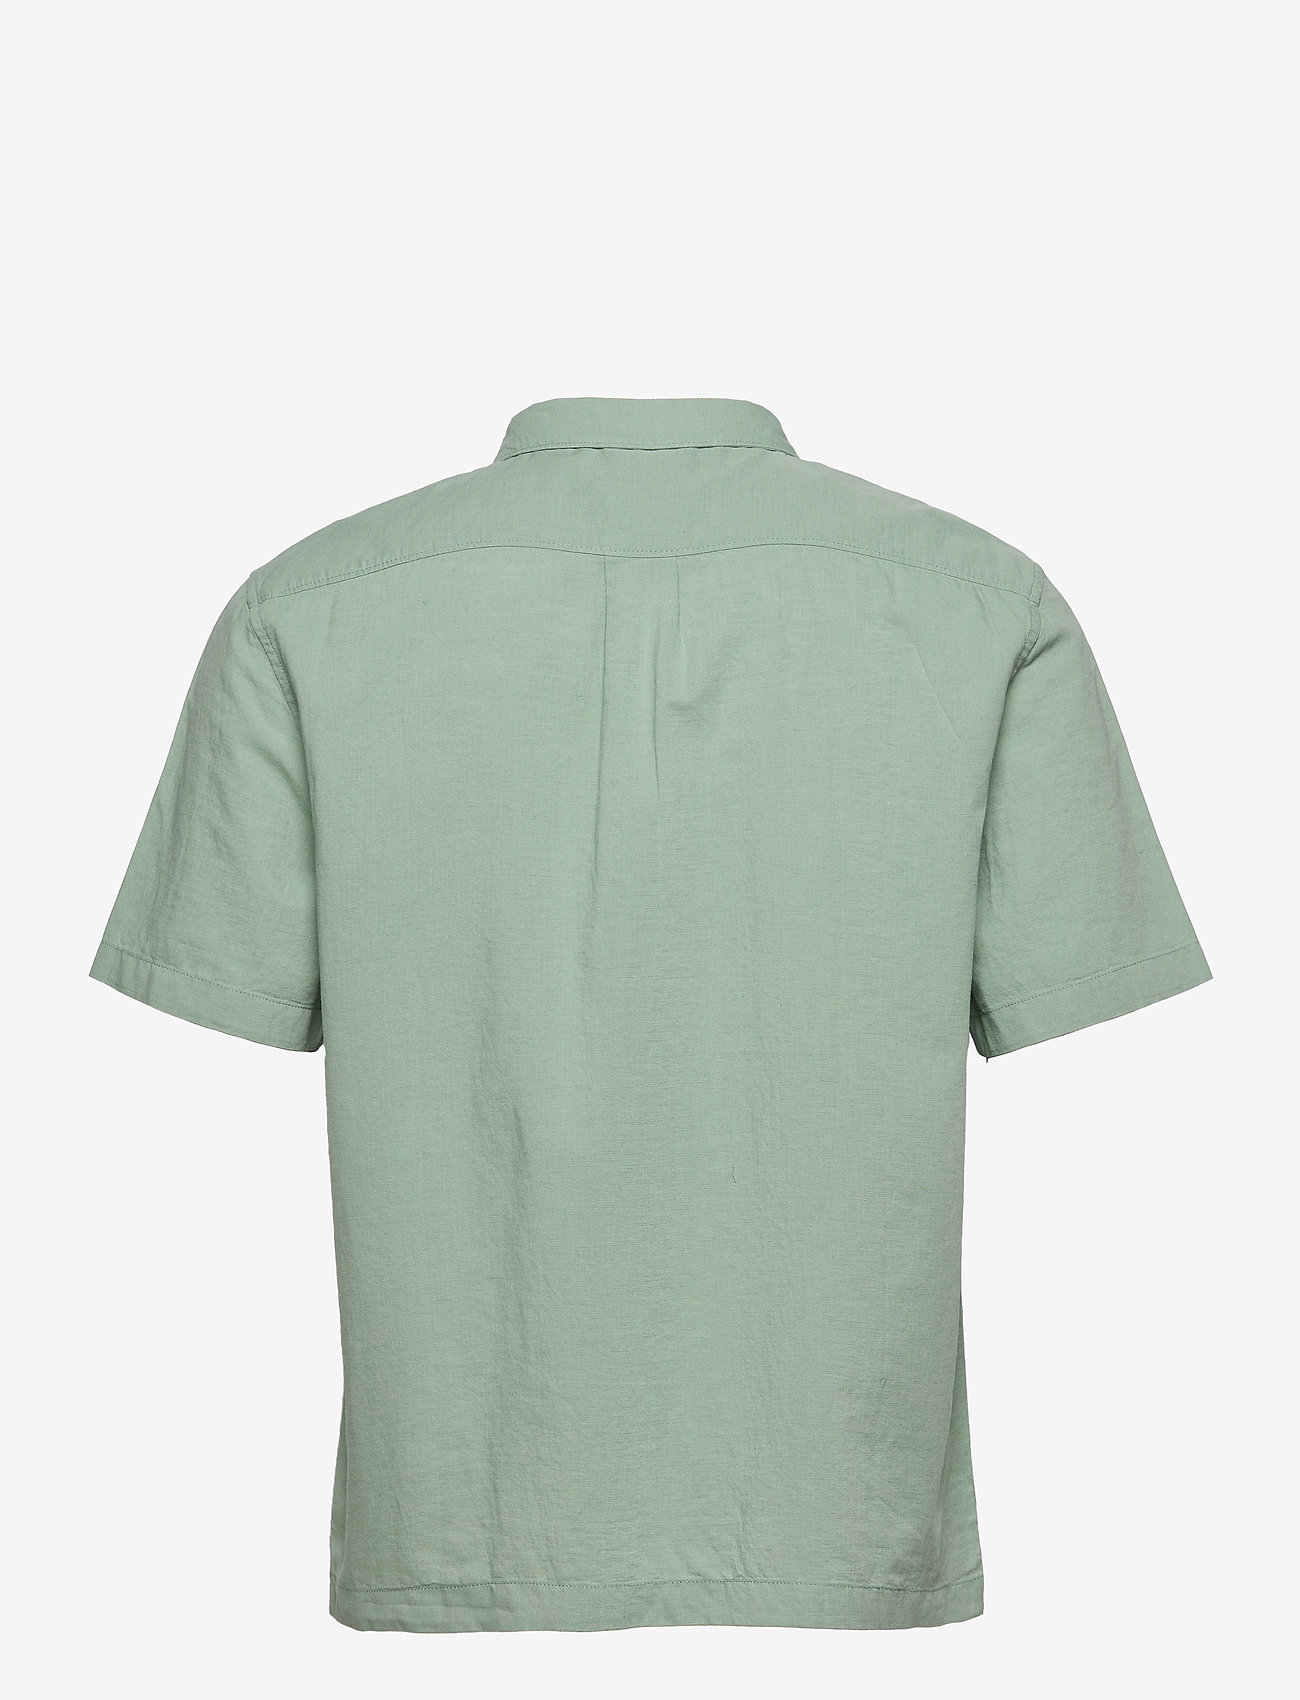 Lee Jeans - SS RESORT SHIRT - basic shirts - granite green - 1